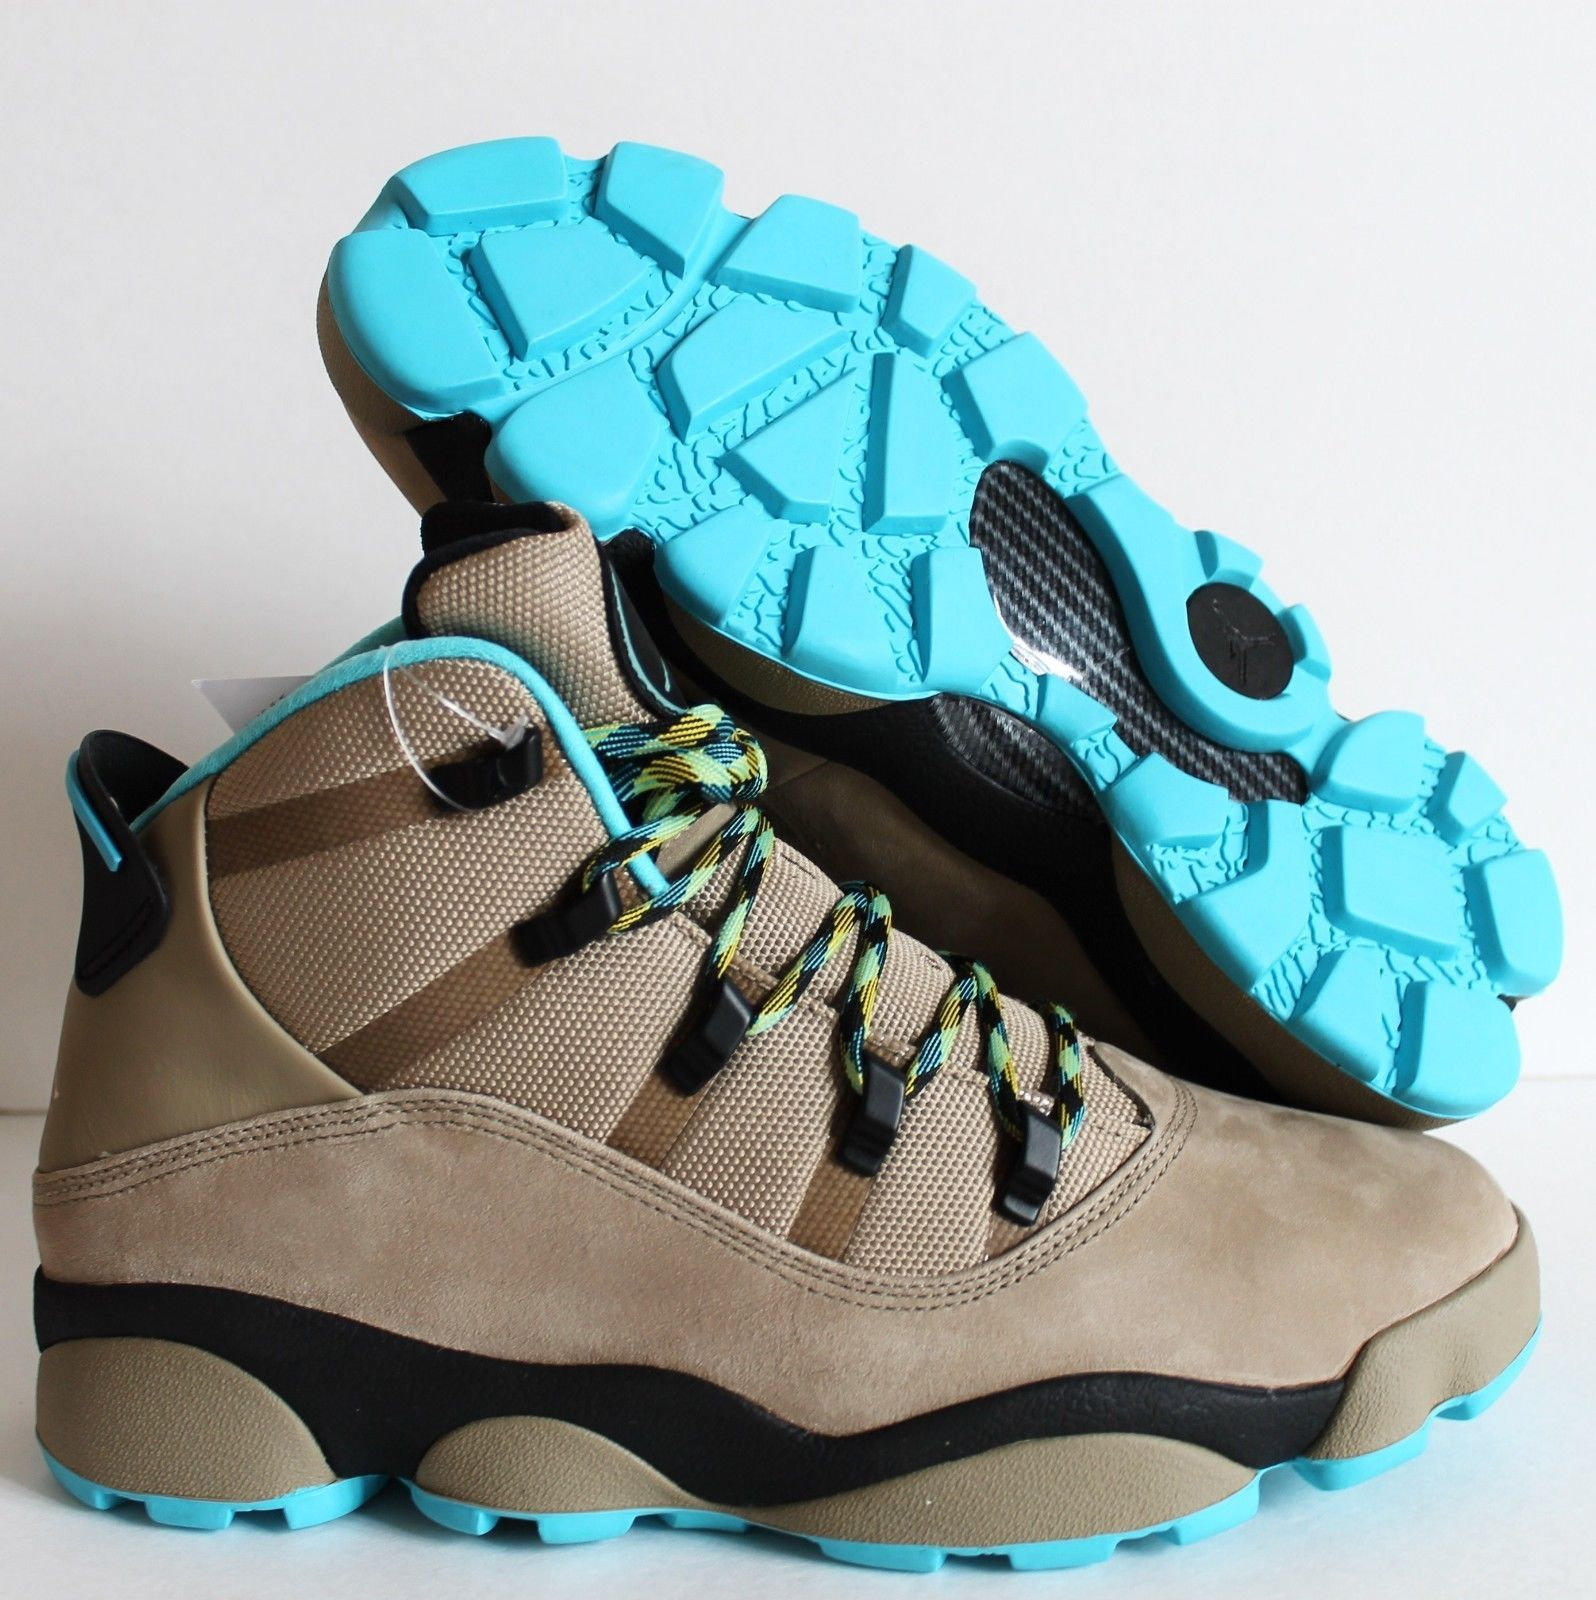 9b64c30f86c buy nike air jordan winterized 6 rings boots khaki gamma blue sz 13.5  414845 2a356 dd91e